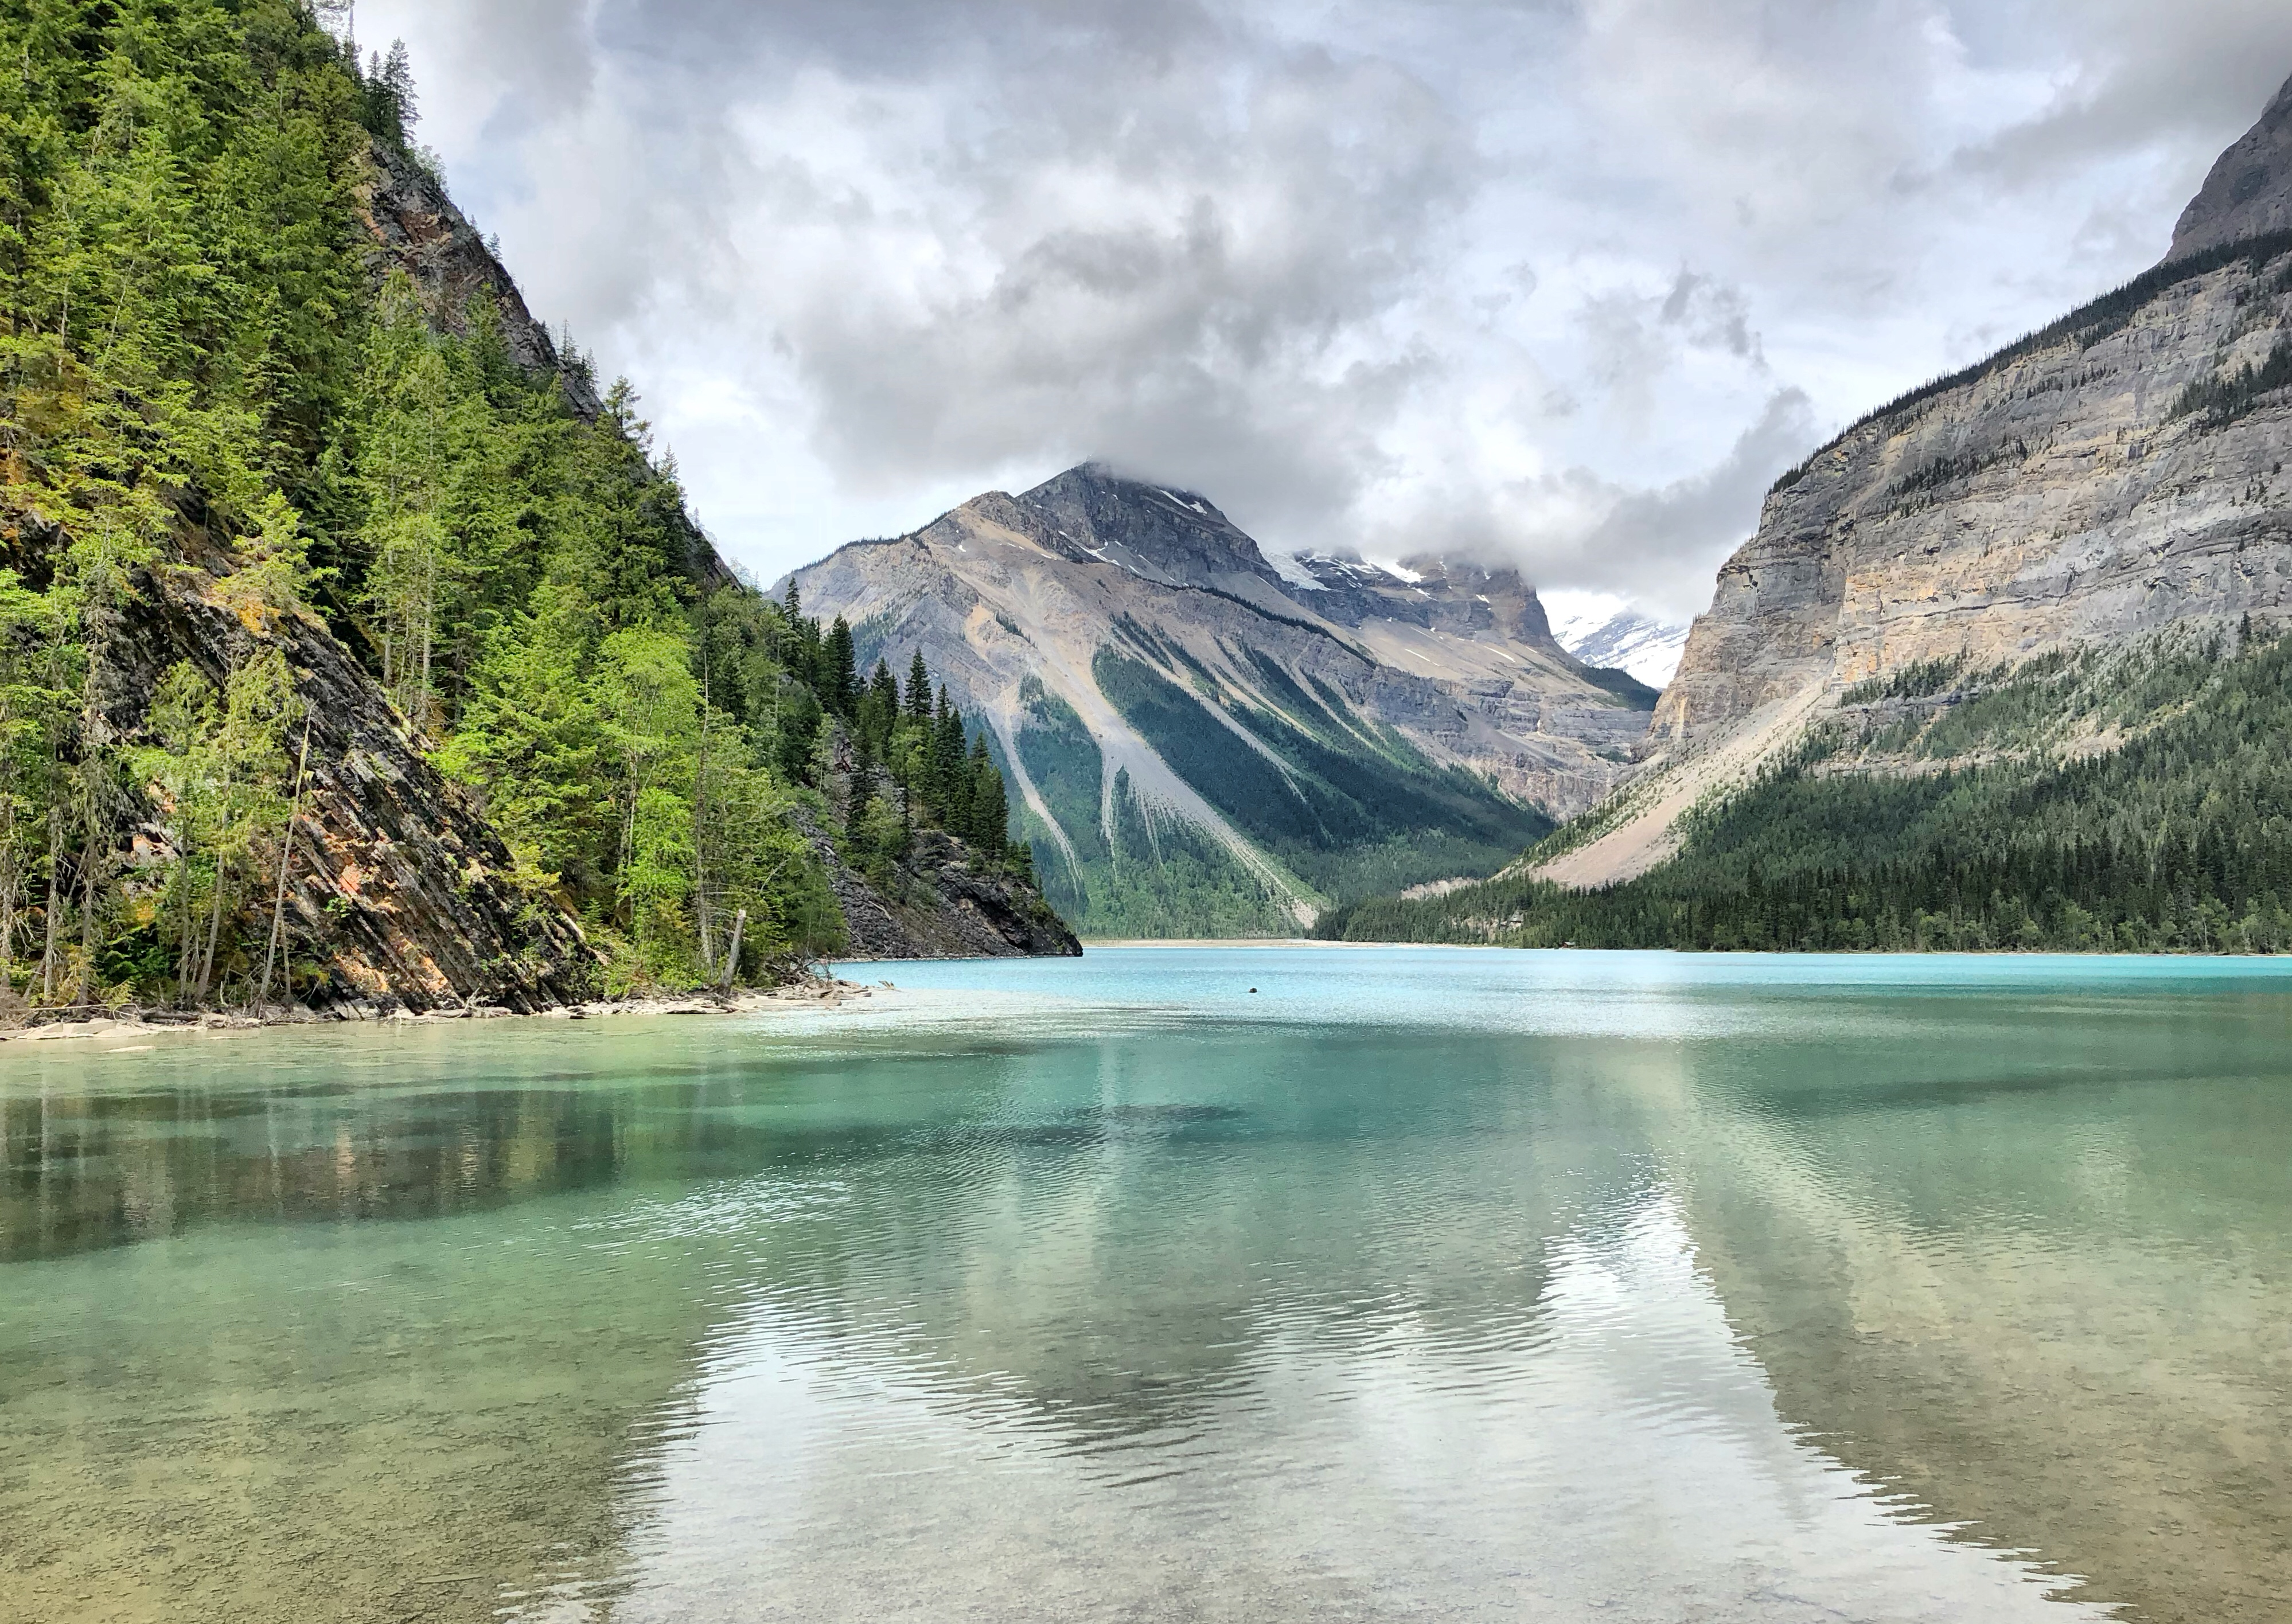 Canada Rockies TrekAmerica Itrekhere 2018 504